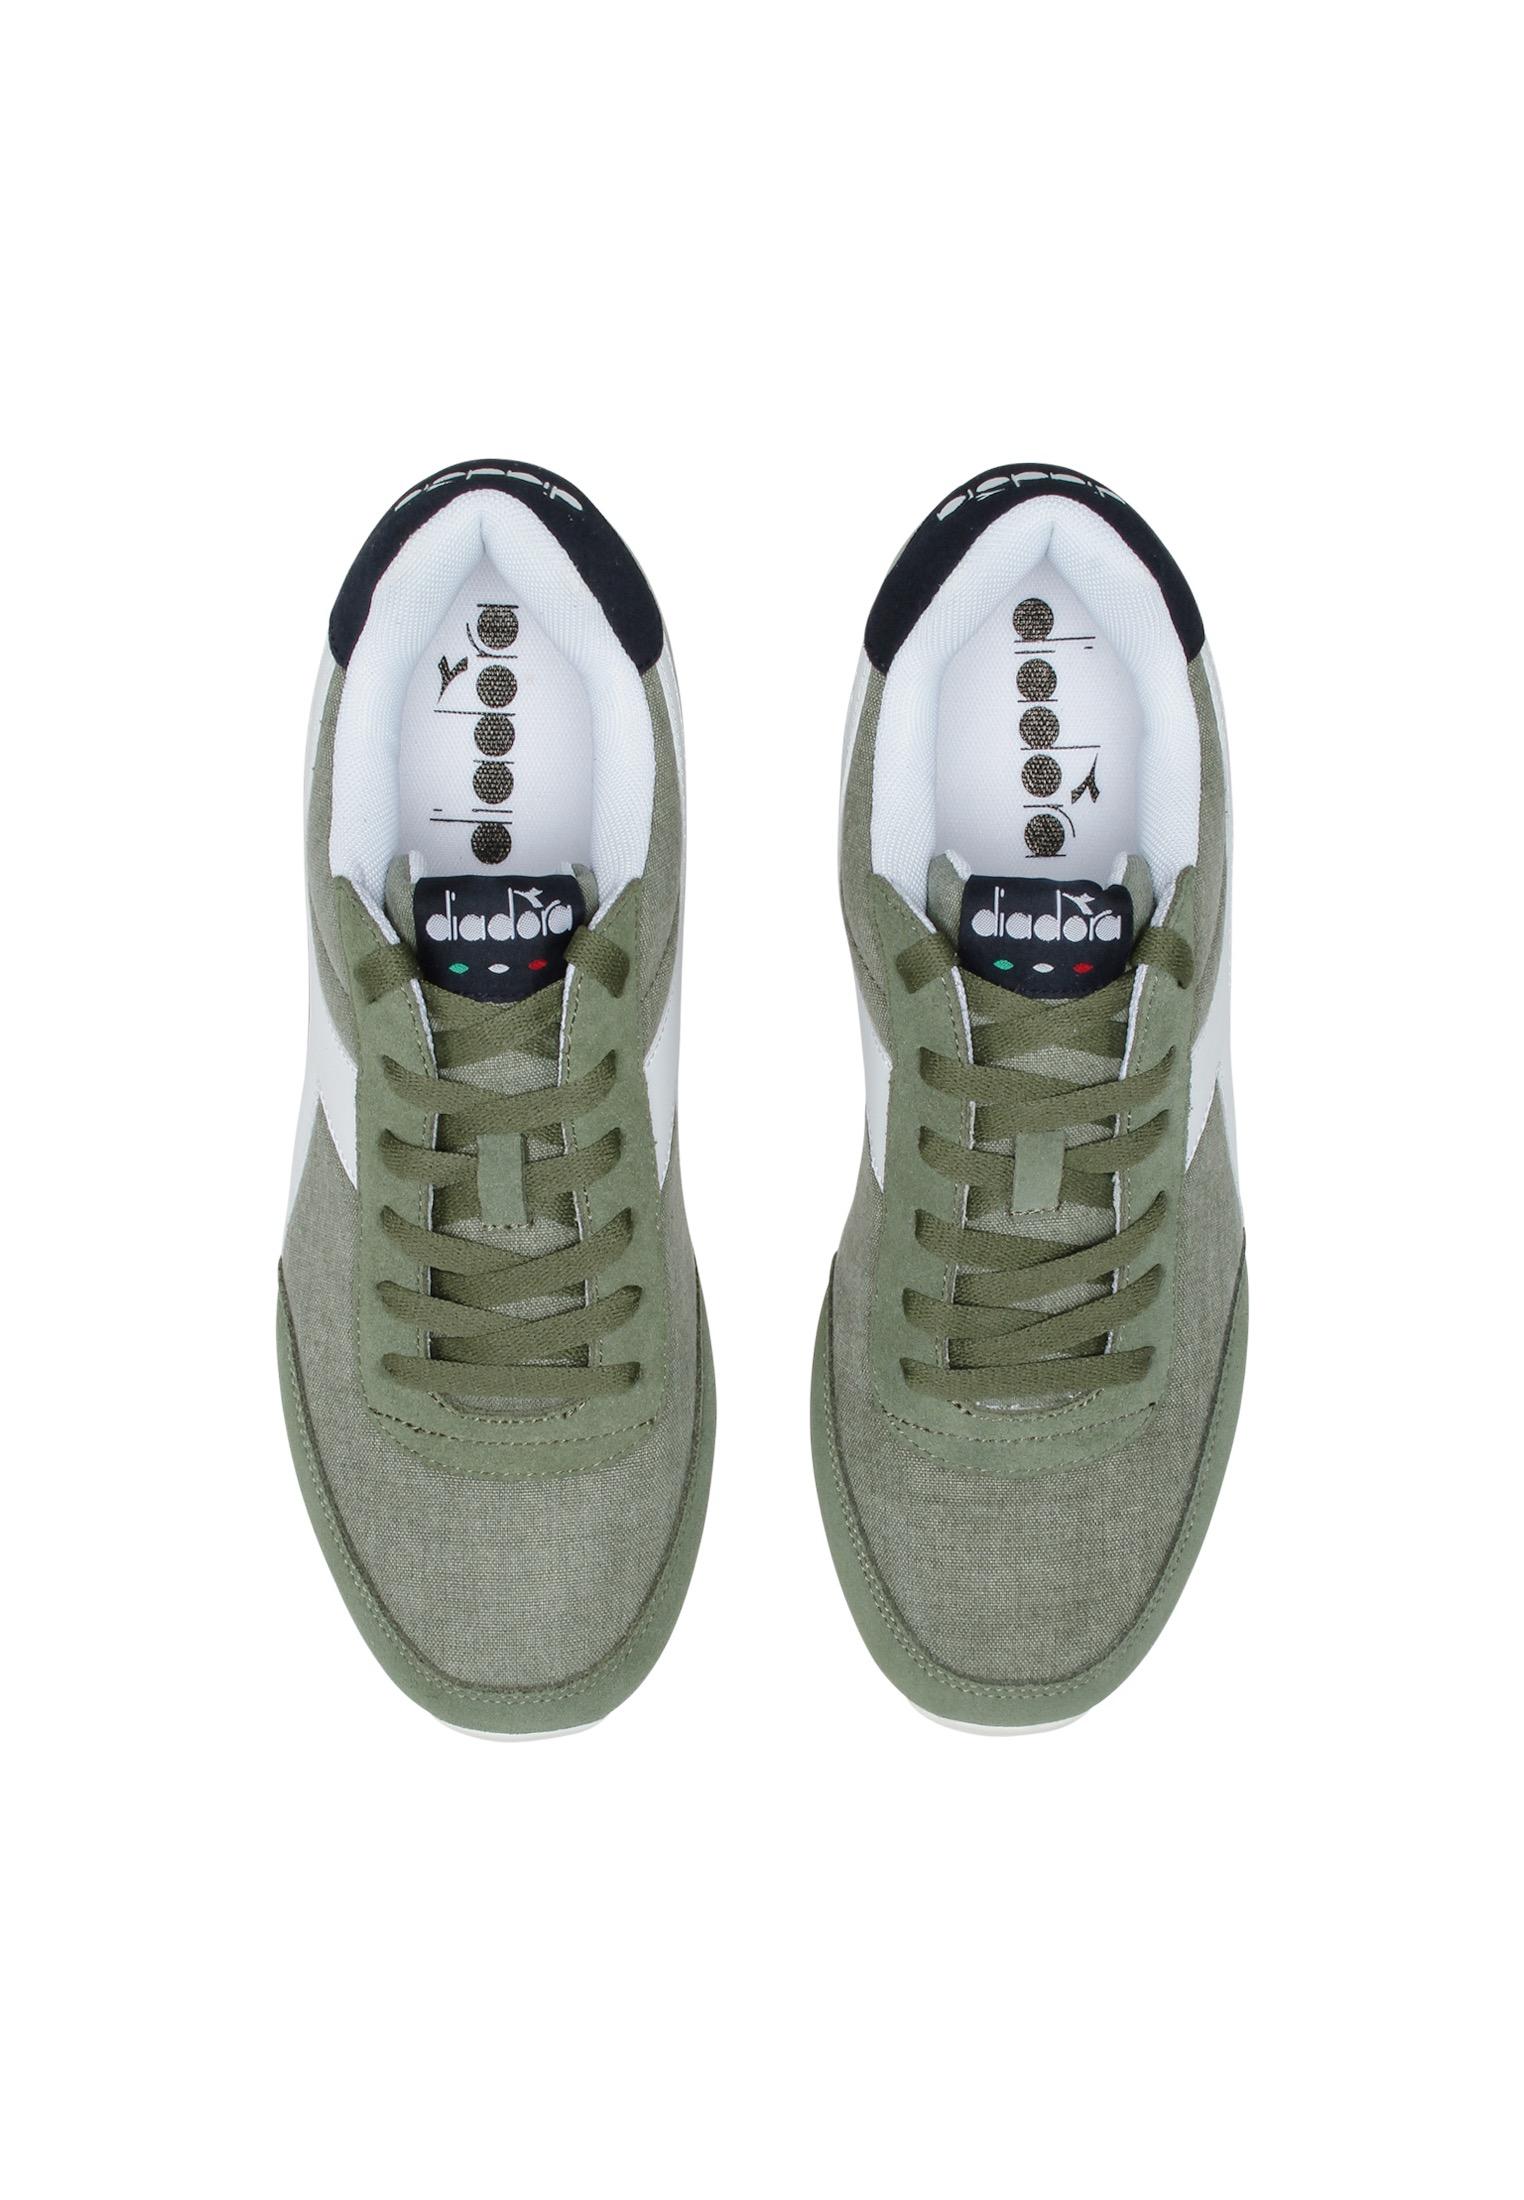 Scarpe-Diadora-Jog-Light-C-Sneakers-sportive-uomo-donna-vari-colori-e-taglie miniatura 66